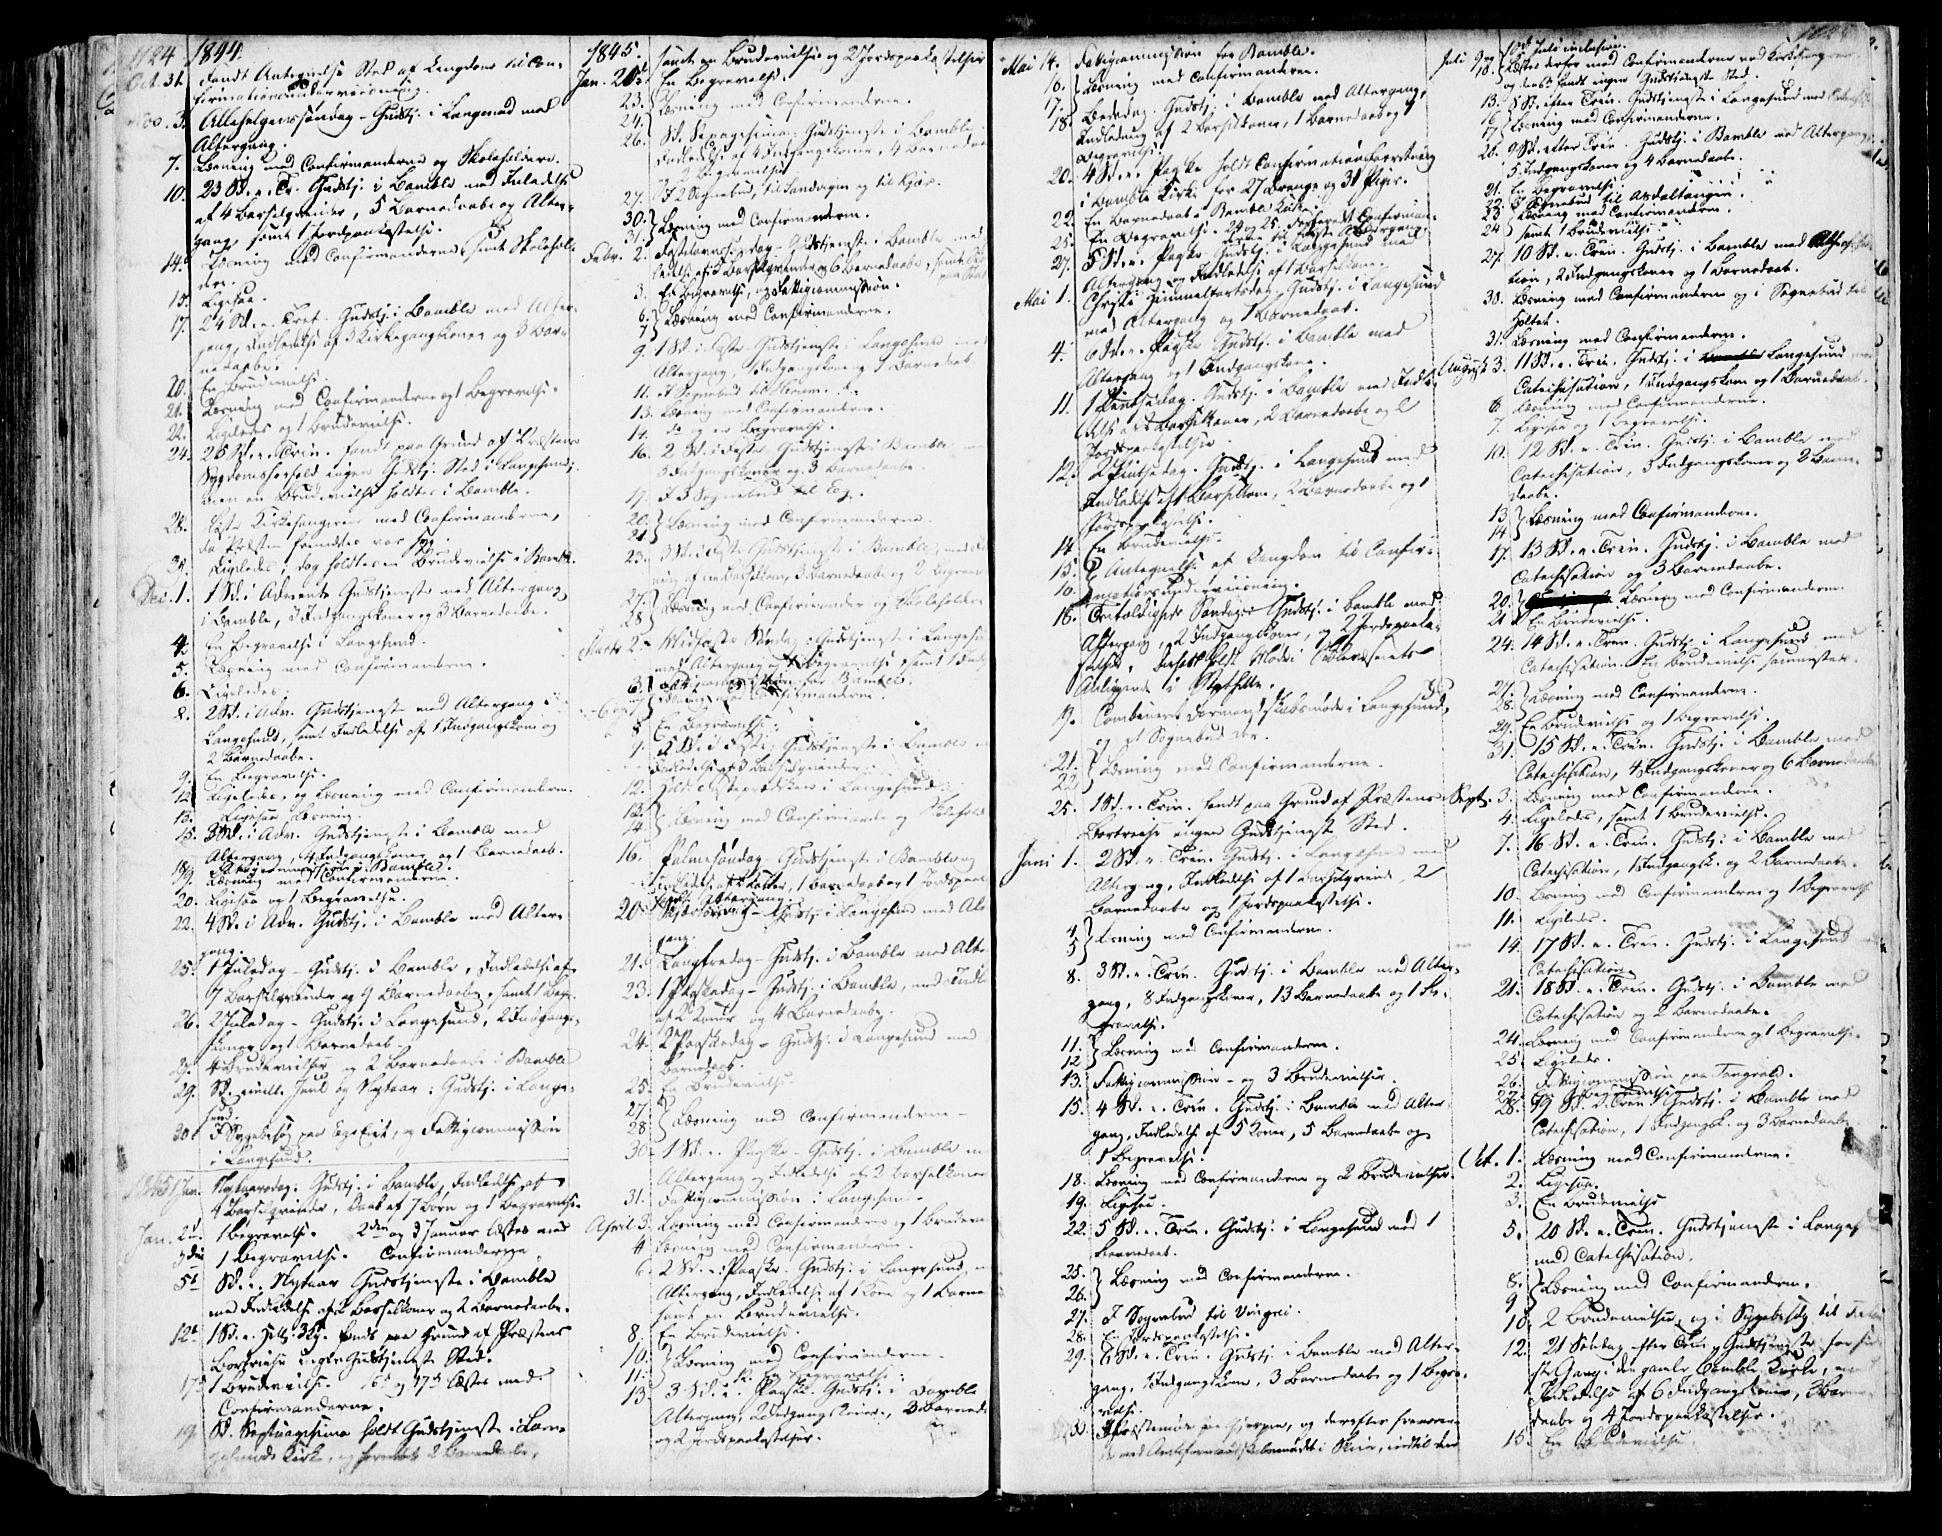 SAKO, Bamble kirkebøker, F/Fa/L0004: Ministerialbok nr. I 4, 1834-1853, s. 1124-1125